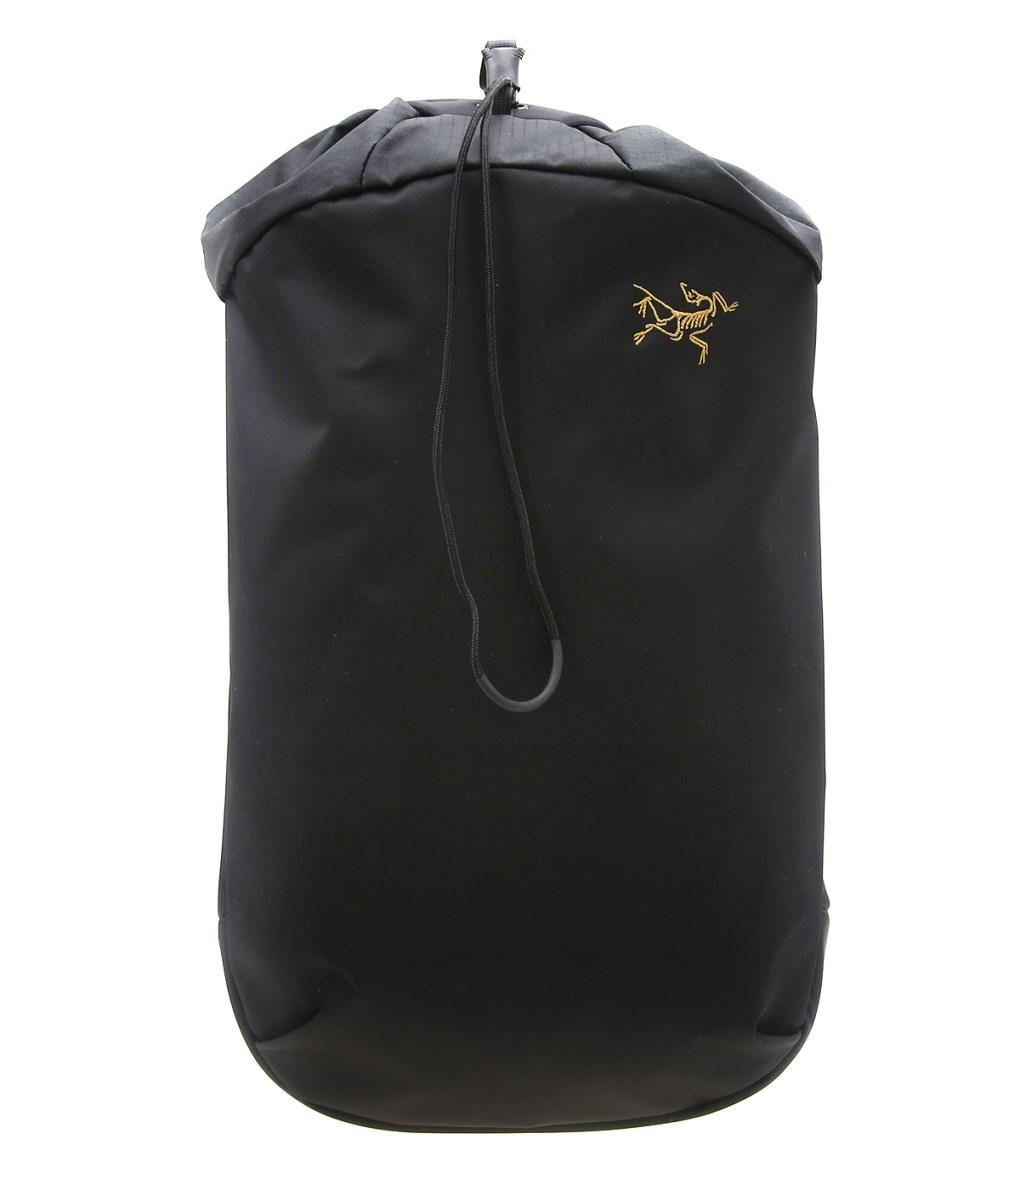 ARC'TERYX / アークテリクス : Arro 20 Bucket Bag : アロー バケット バッグ アークテリクス メンズ : L07244900 【STD】【REA】